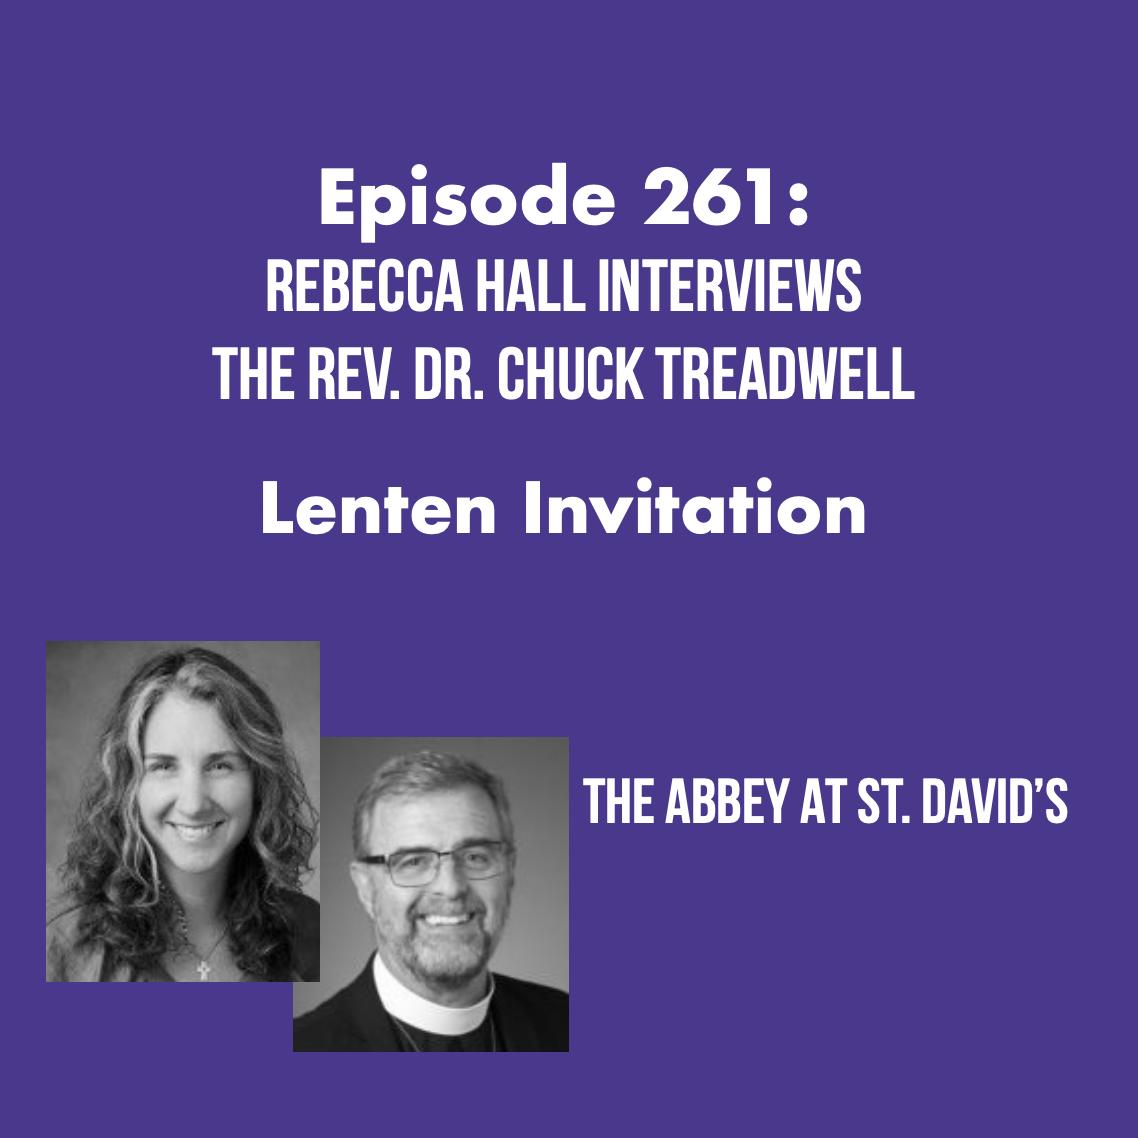 Episode 261: Rebecca Hall Interviews The Rev. Chuck Treadwell About the Lenten Invitation